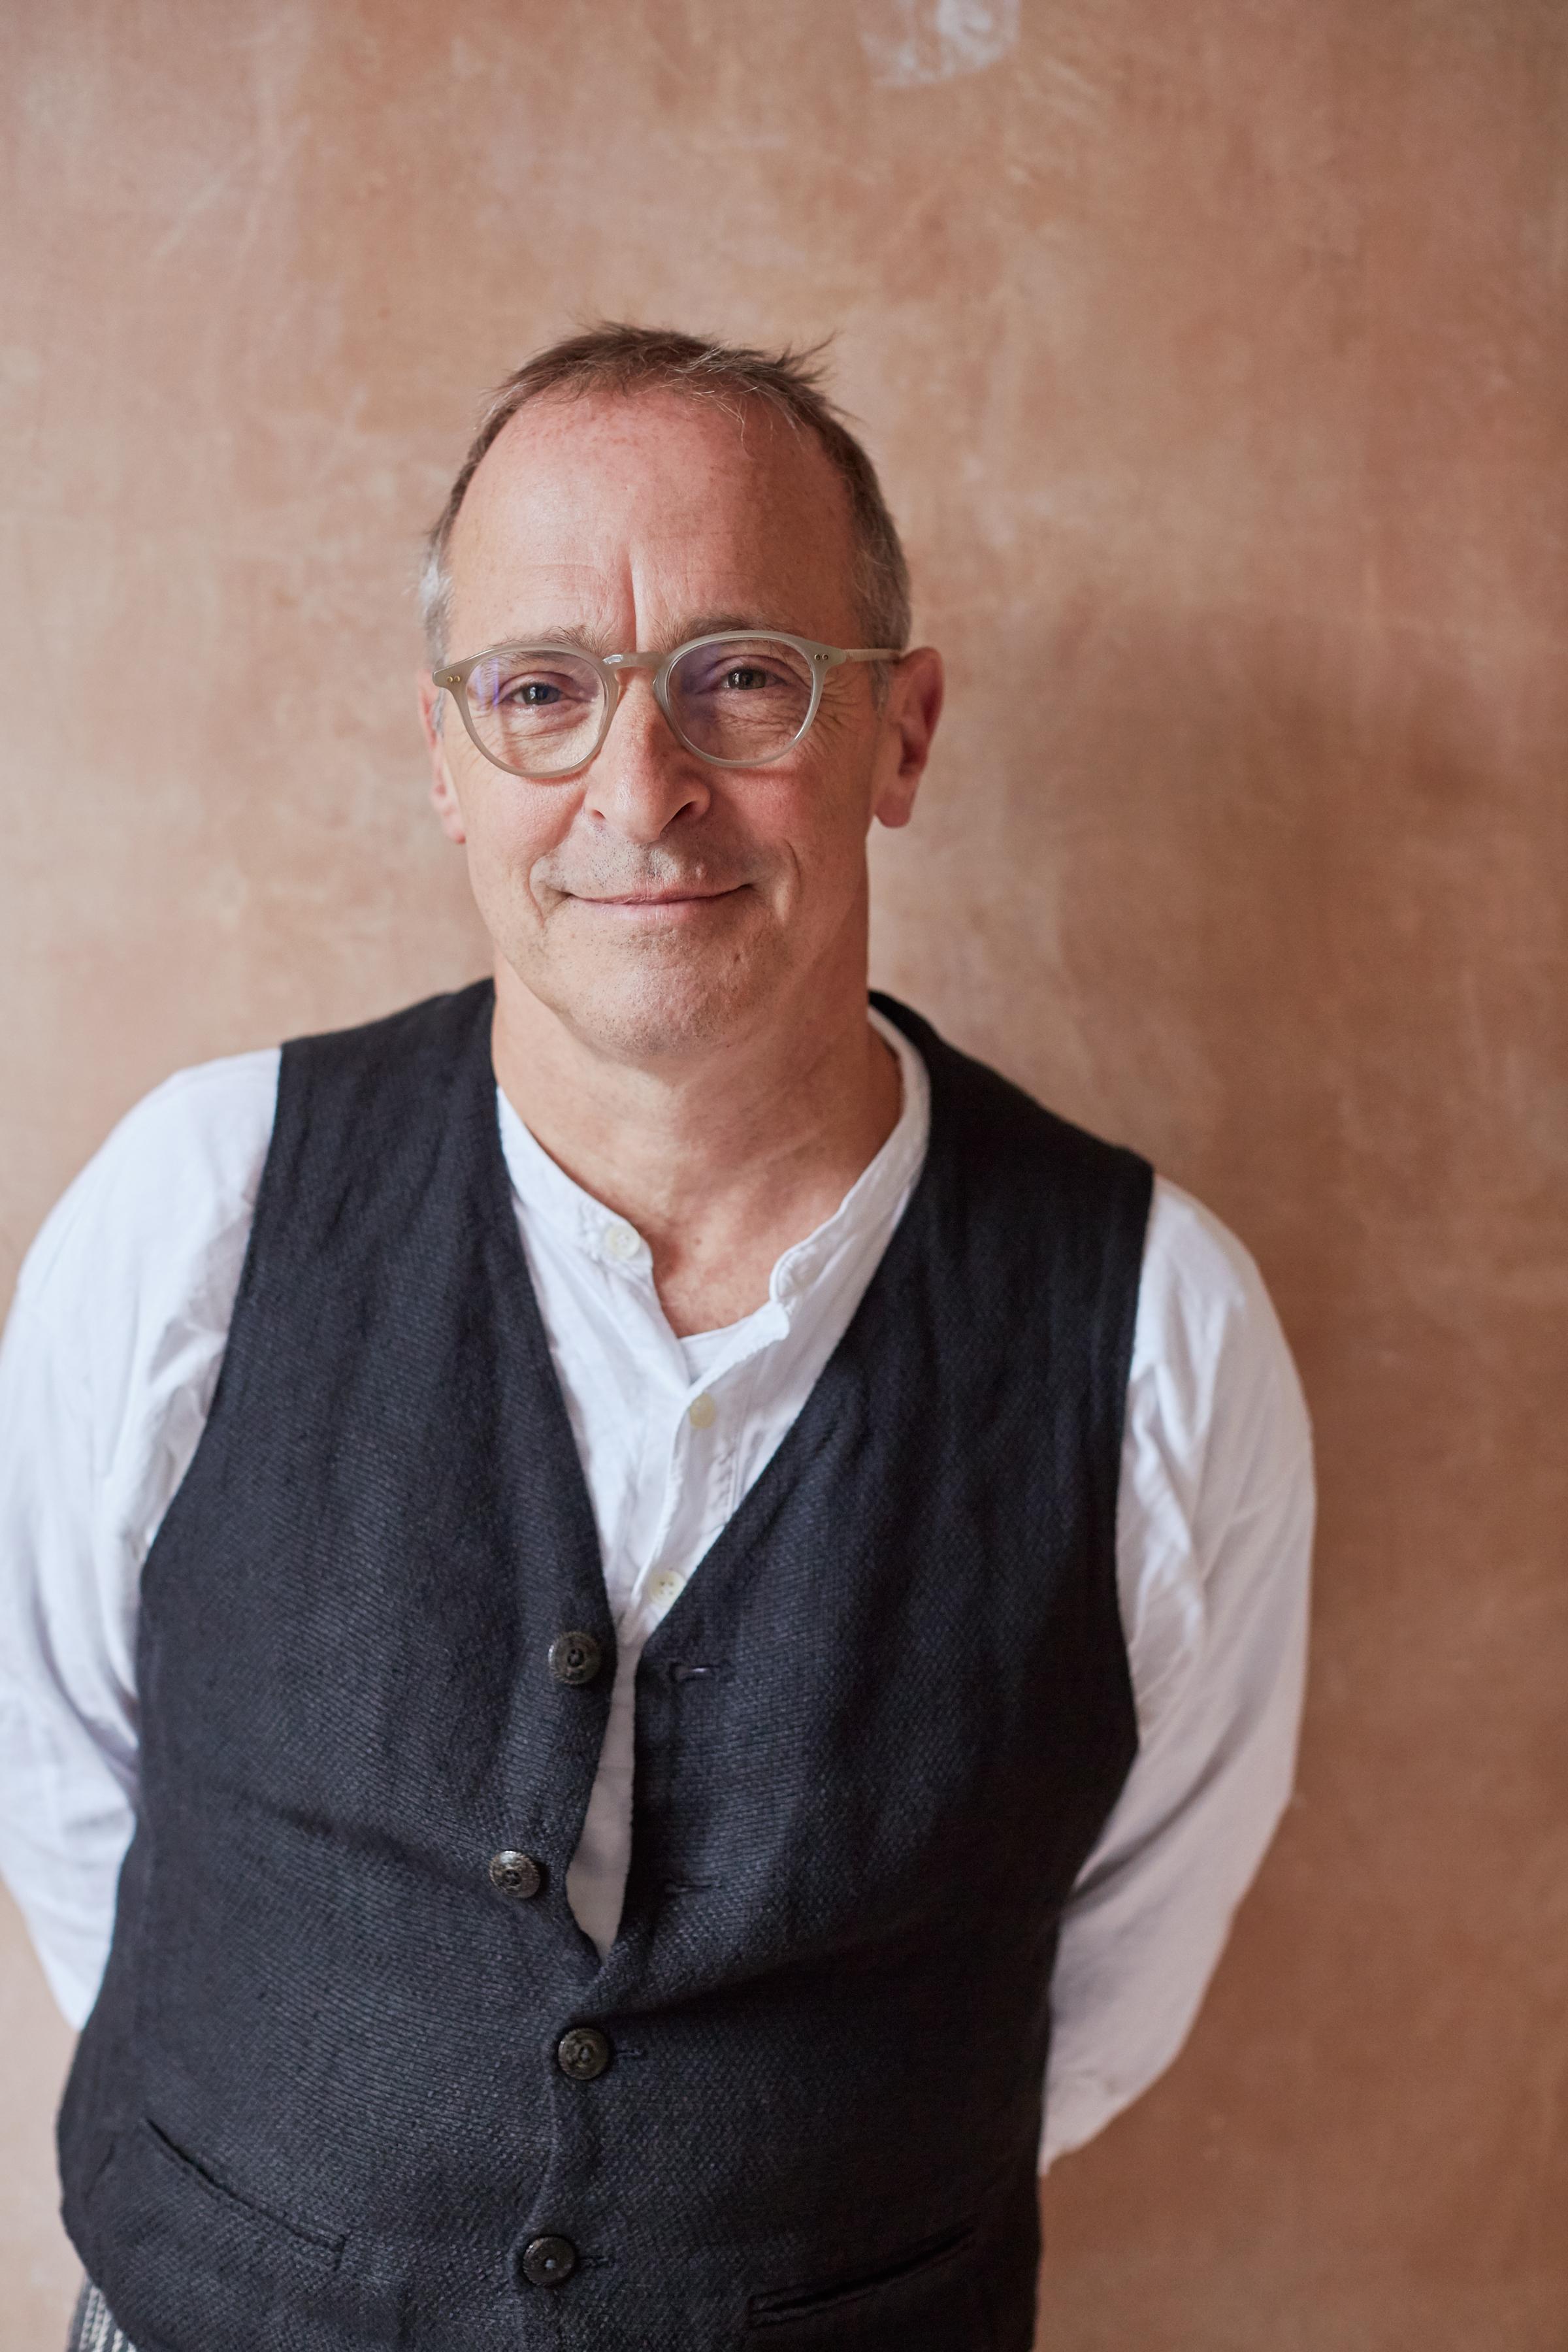 David Sedaris talks ugly about China